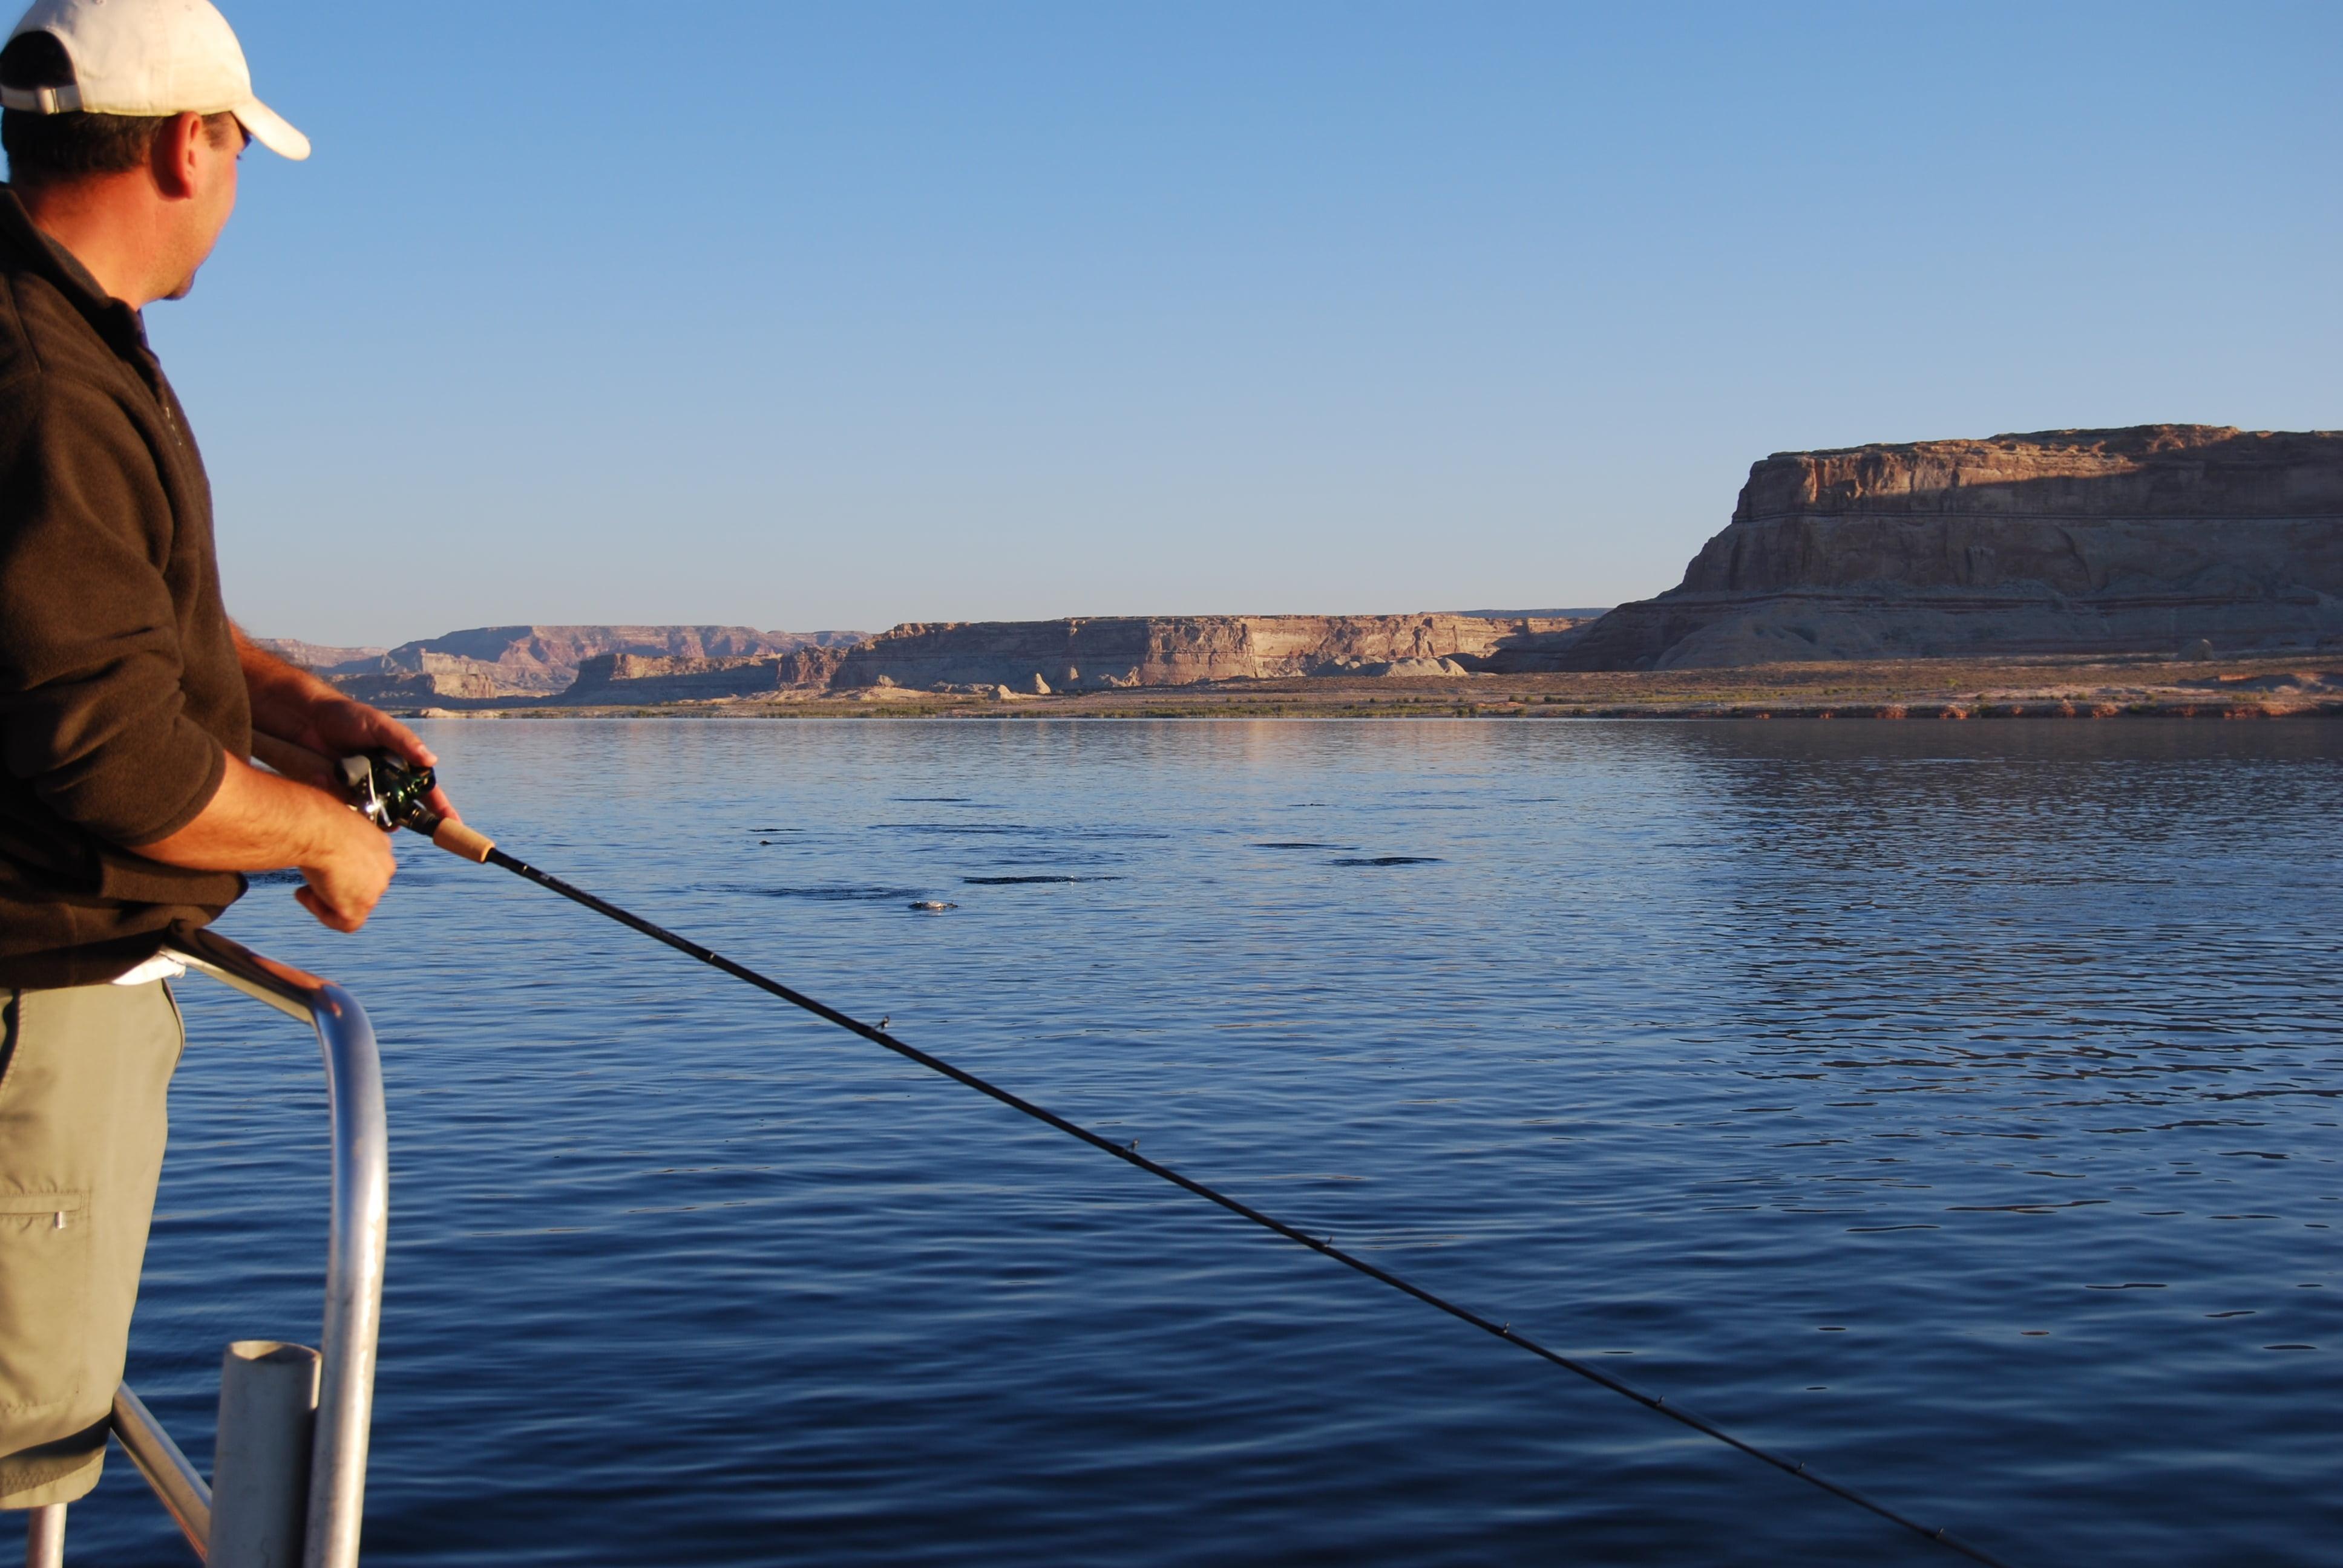 Lake powell fishing report by capt bill wayne for Lake powell fishing